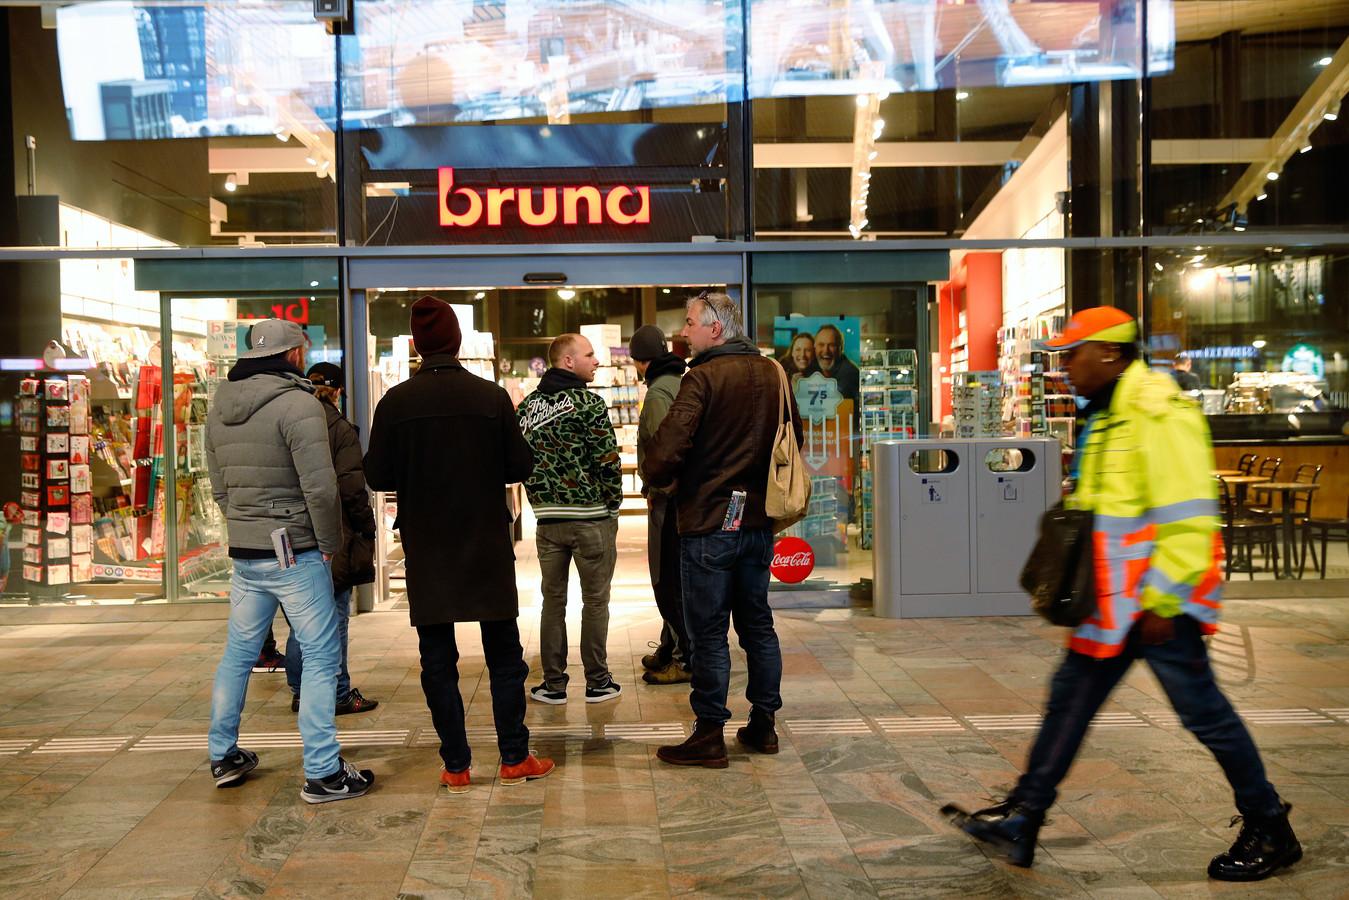 Bruna-winkel op het Centraal Station in Rotterdam